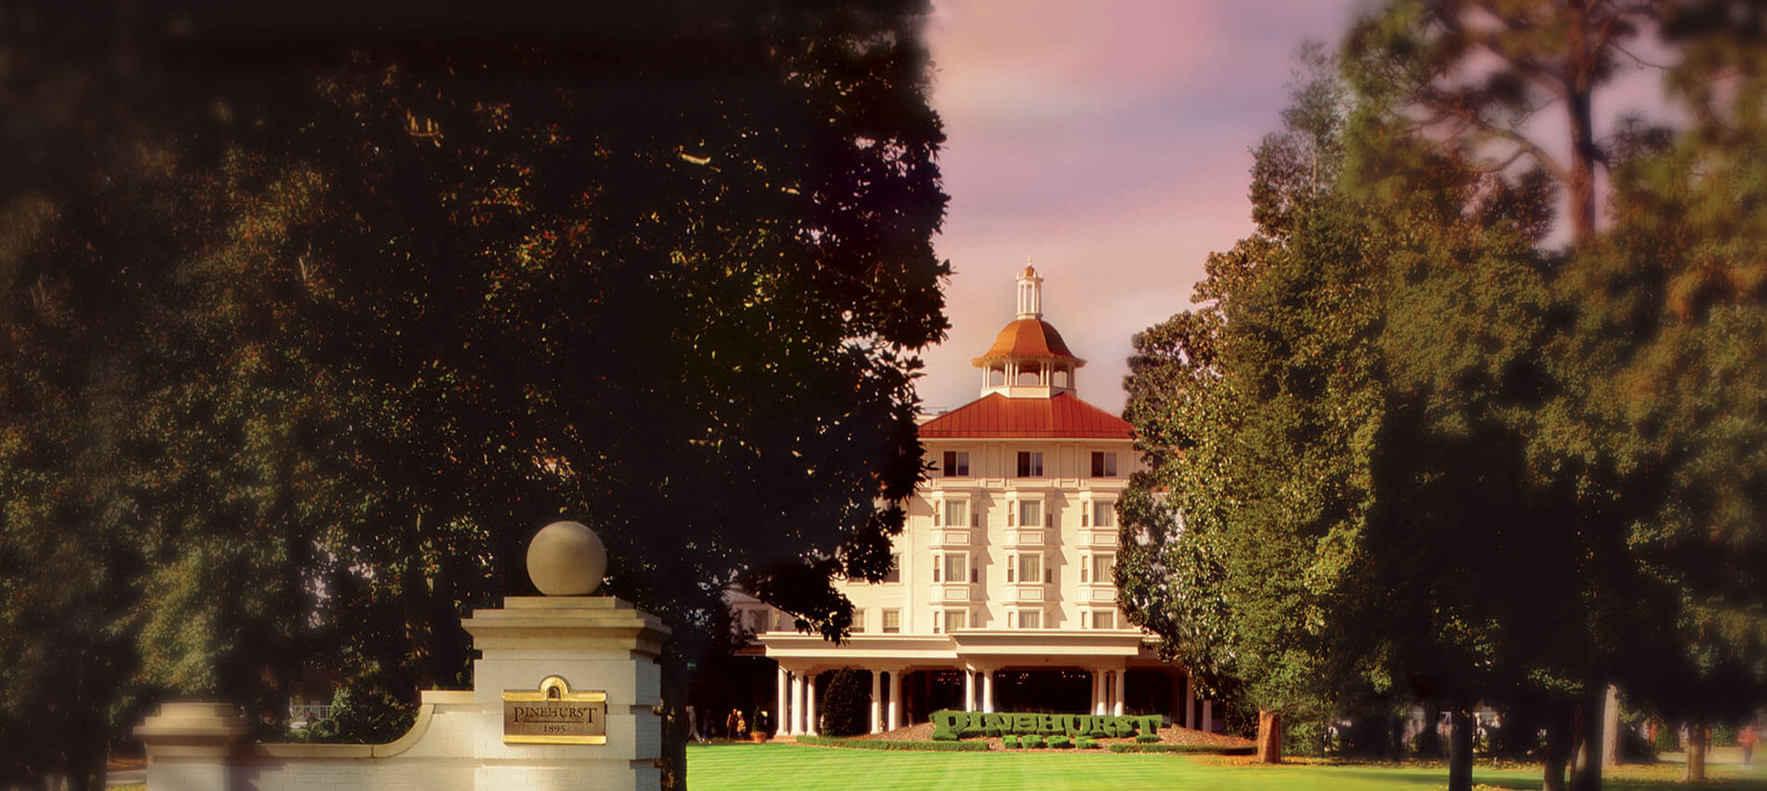 2018 North Carolina Tennis Foundation Hall of Fame Dinner image